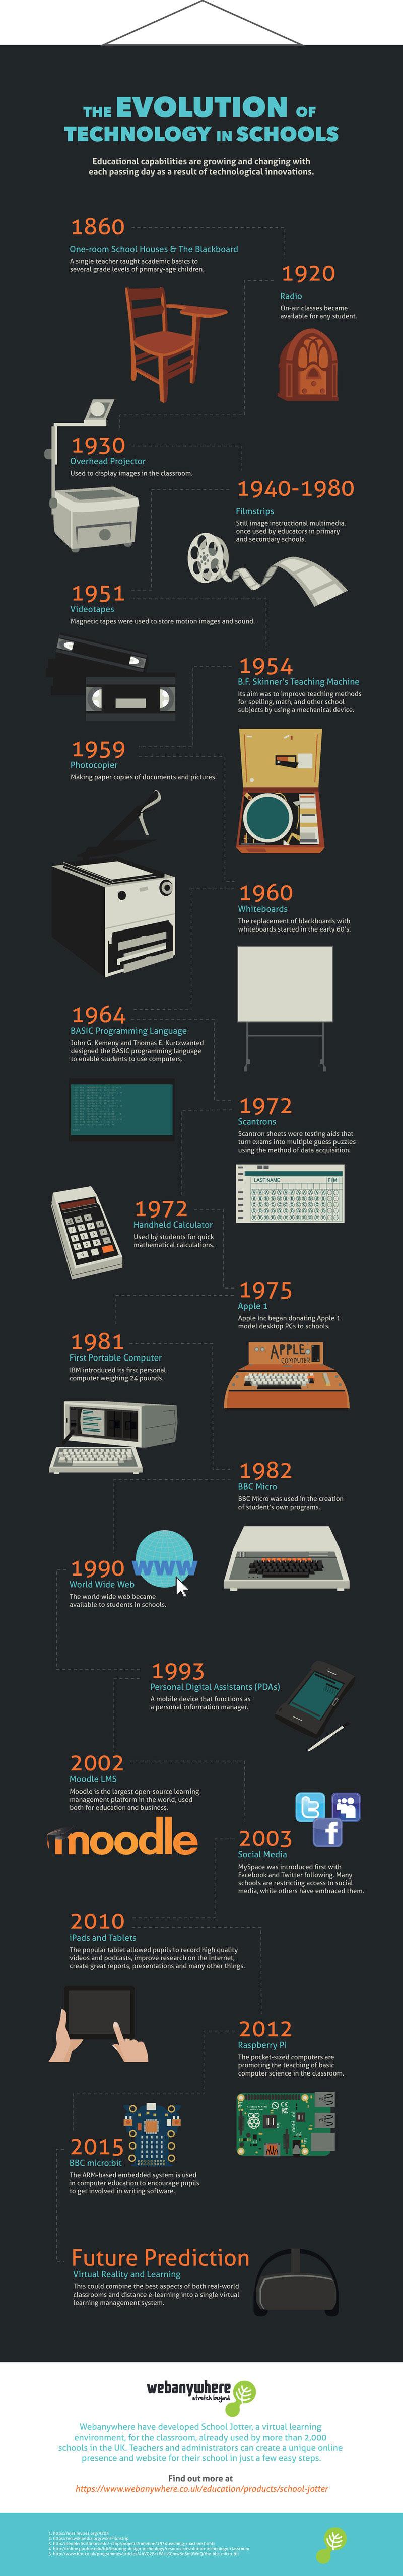 evolution-of-technology-800